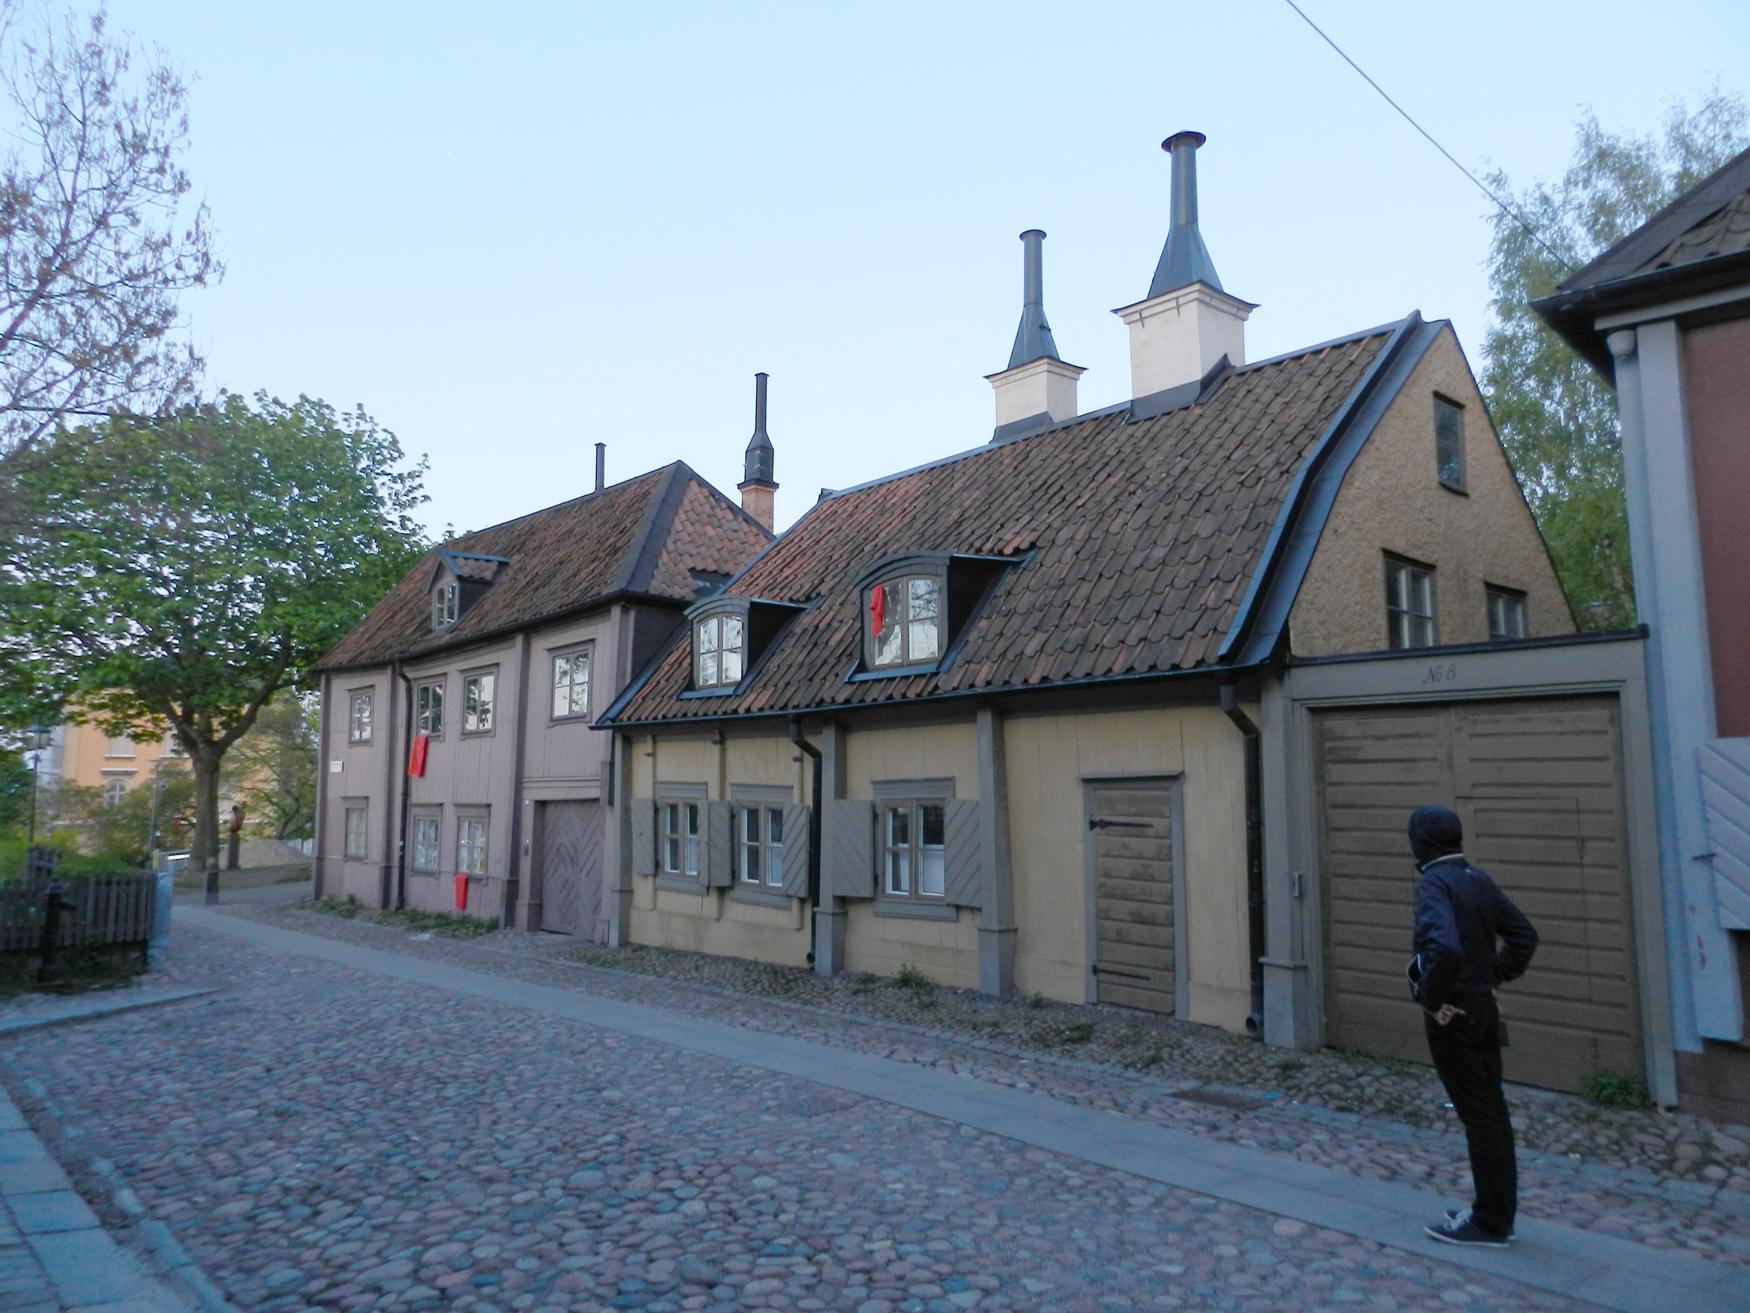 Переулок Master Mikael gata